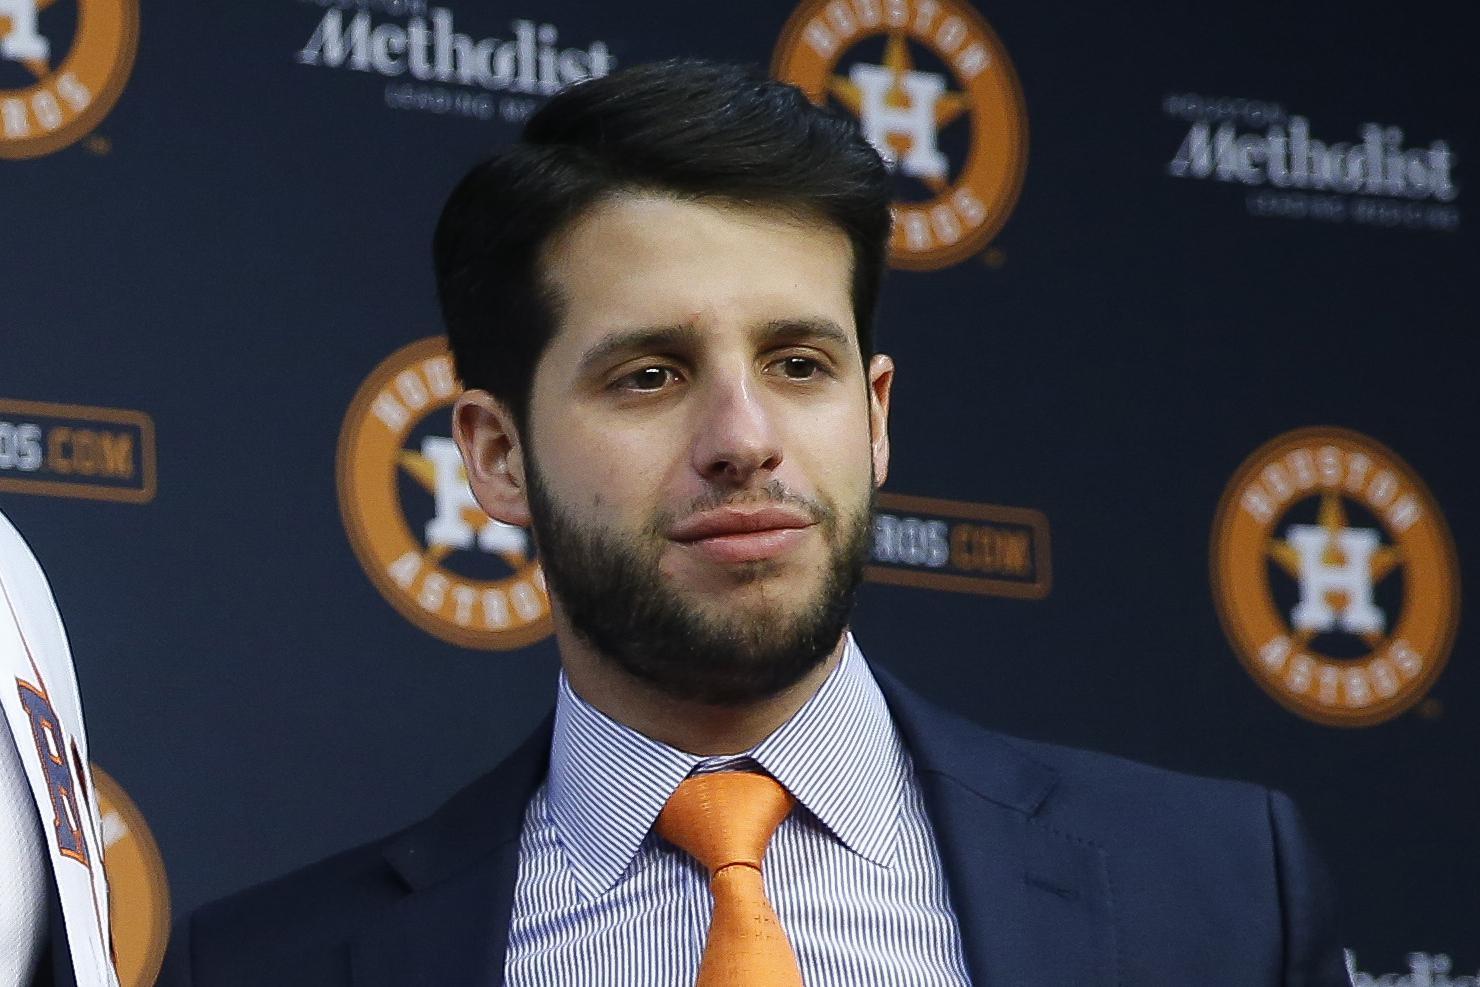 MLB investigating Astros executive's expletive-filled tirade